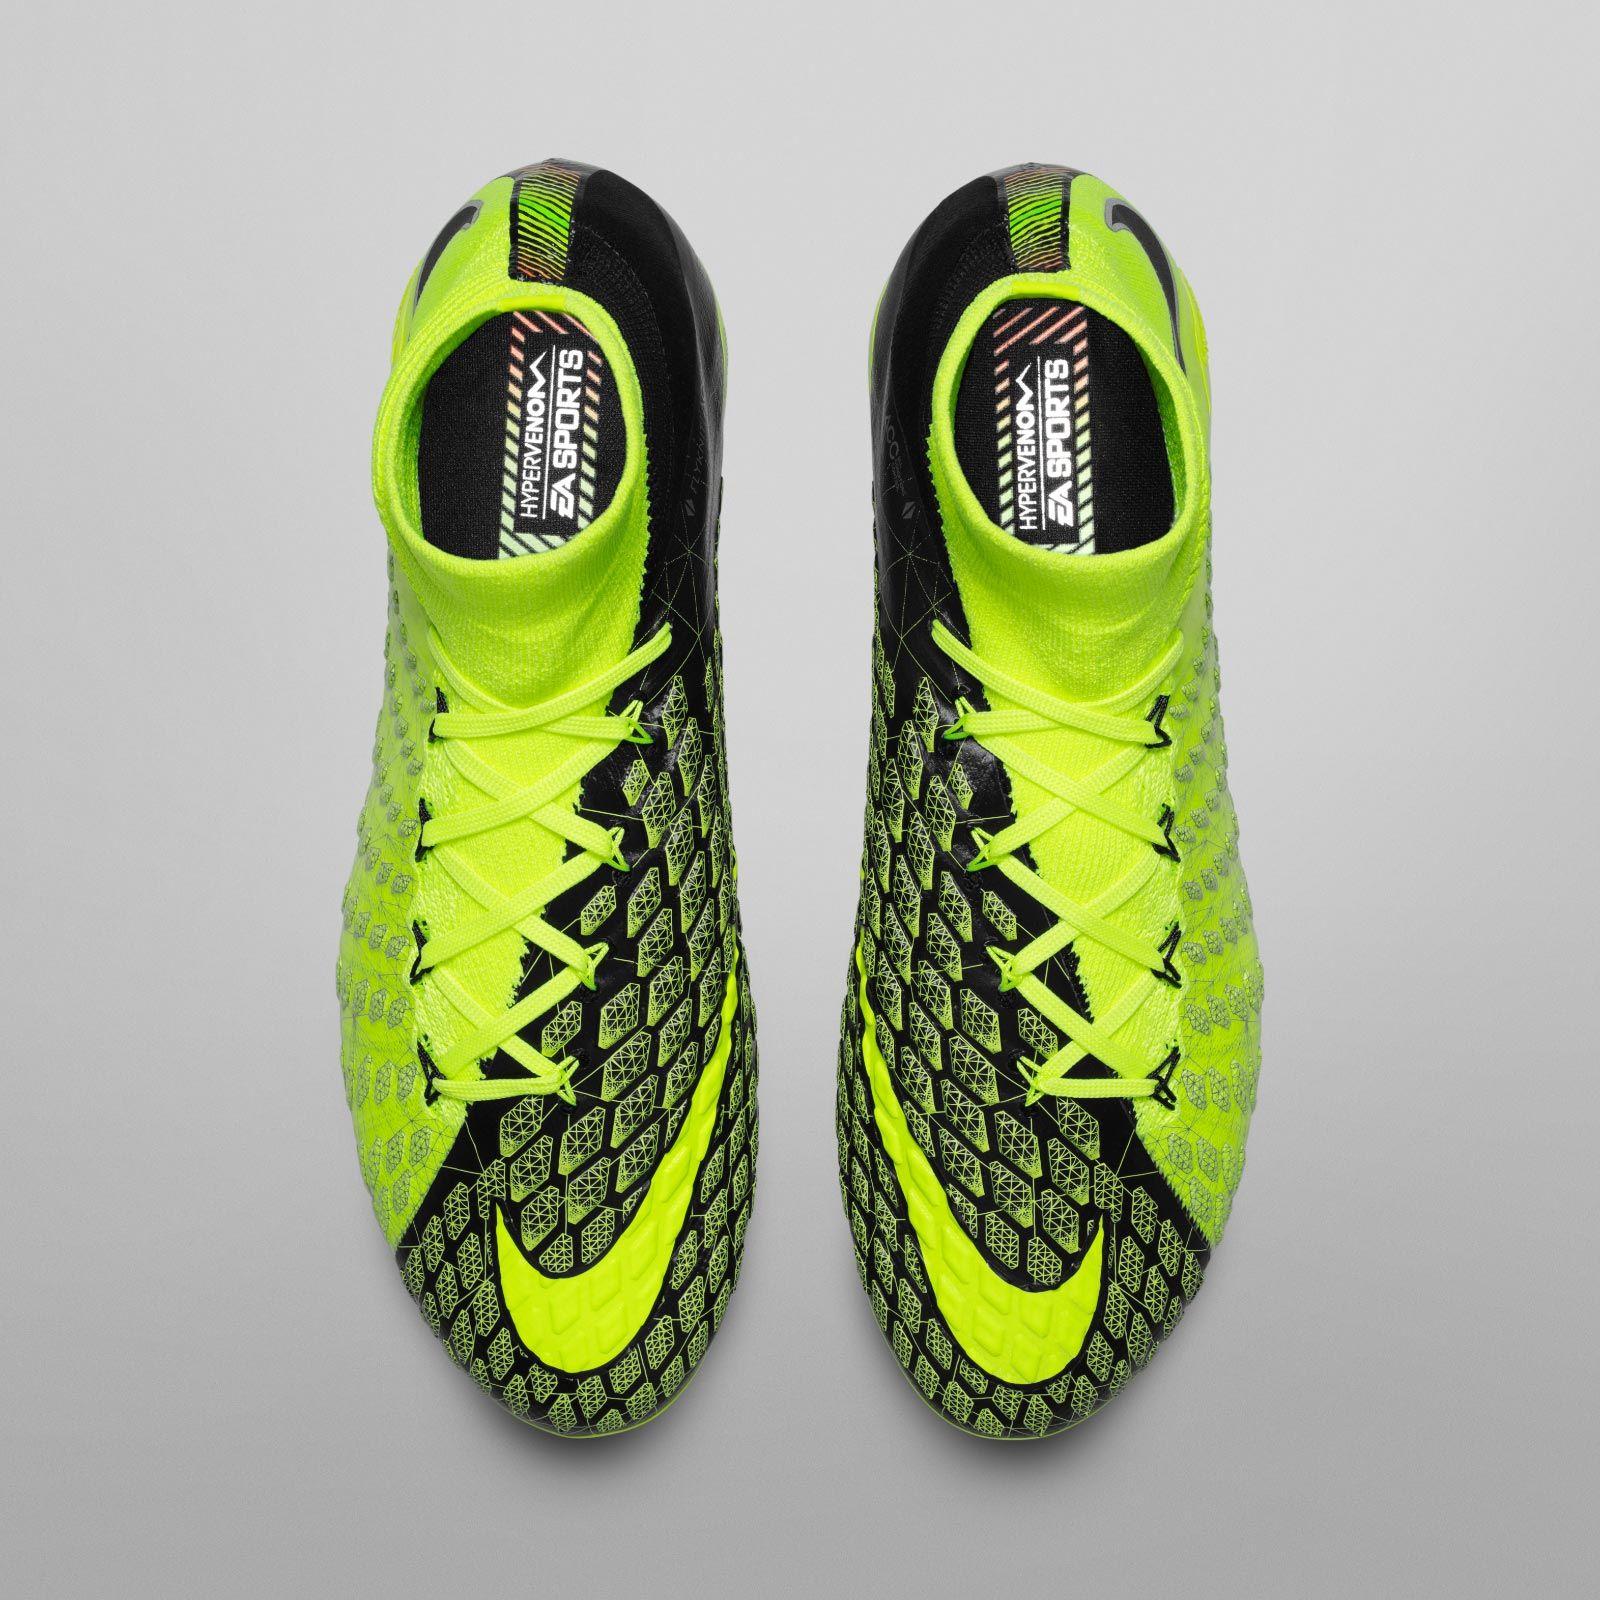 bce6e87e34aa The limited-edition Nike Hypervenom Phantom III EA Sports boots introduce a  striking design